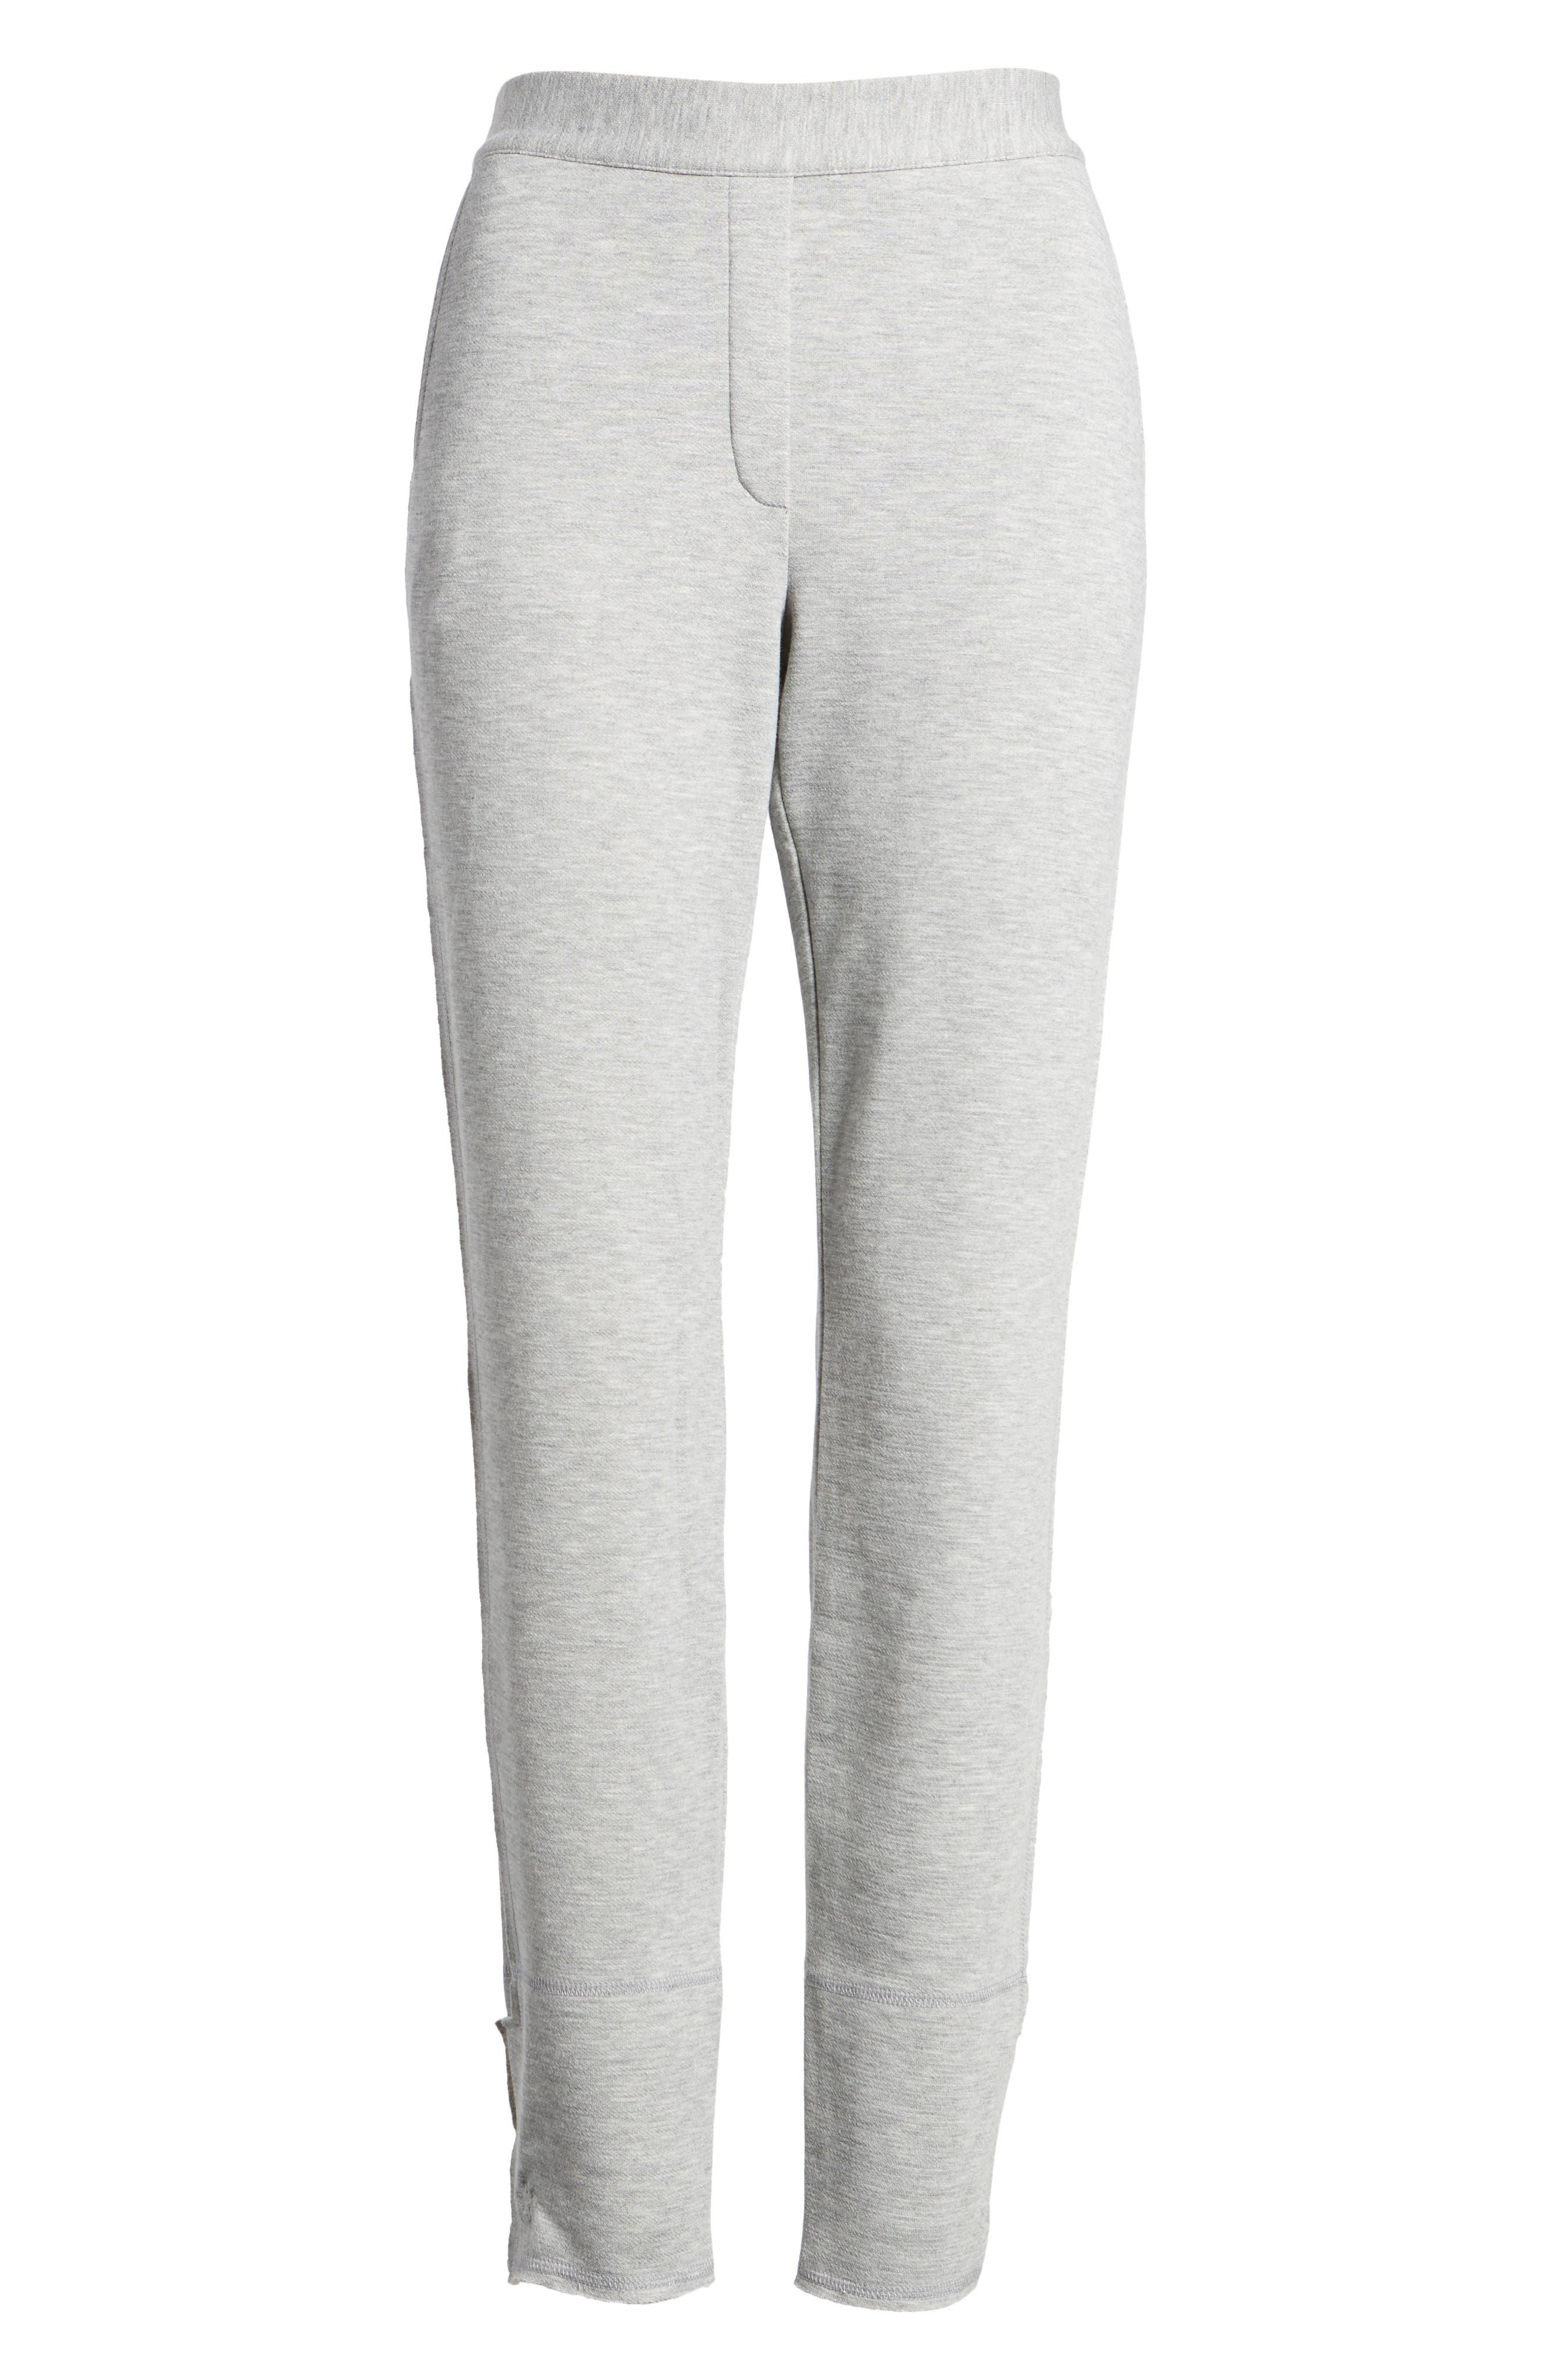 Slim Knit Pants,                             Alternate thumbnail 6, color,                             Heather Grey